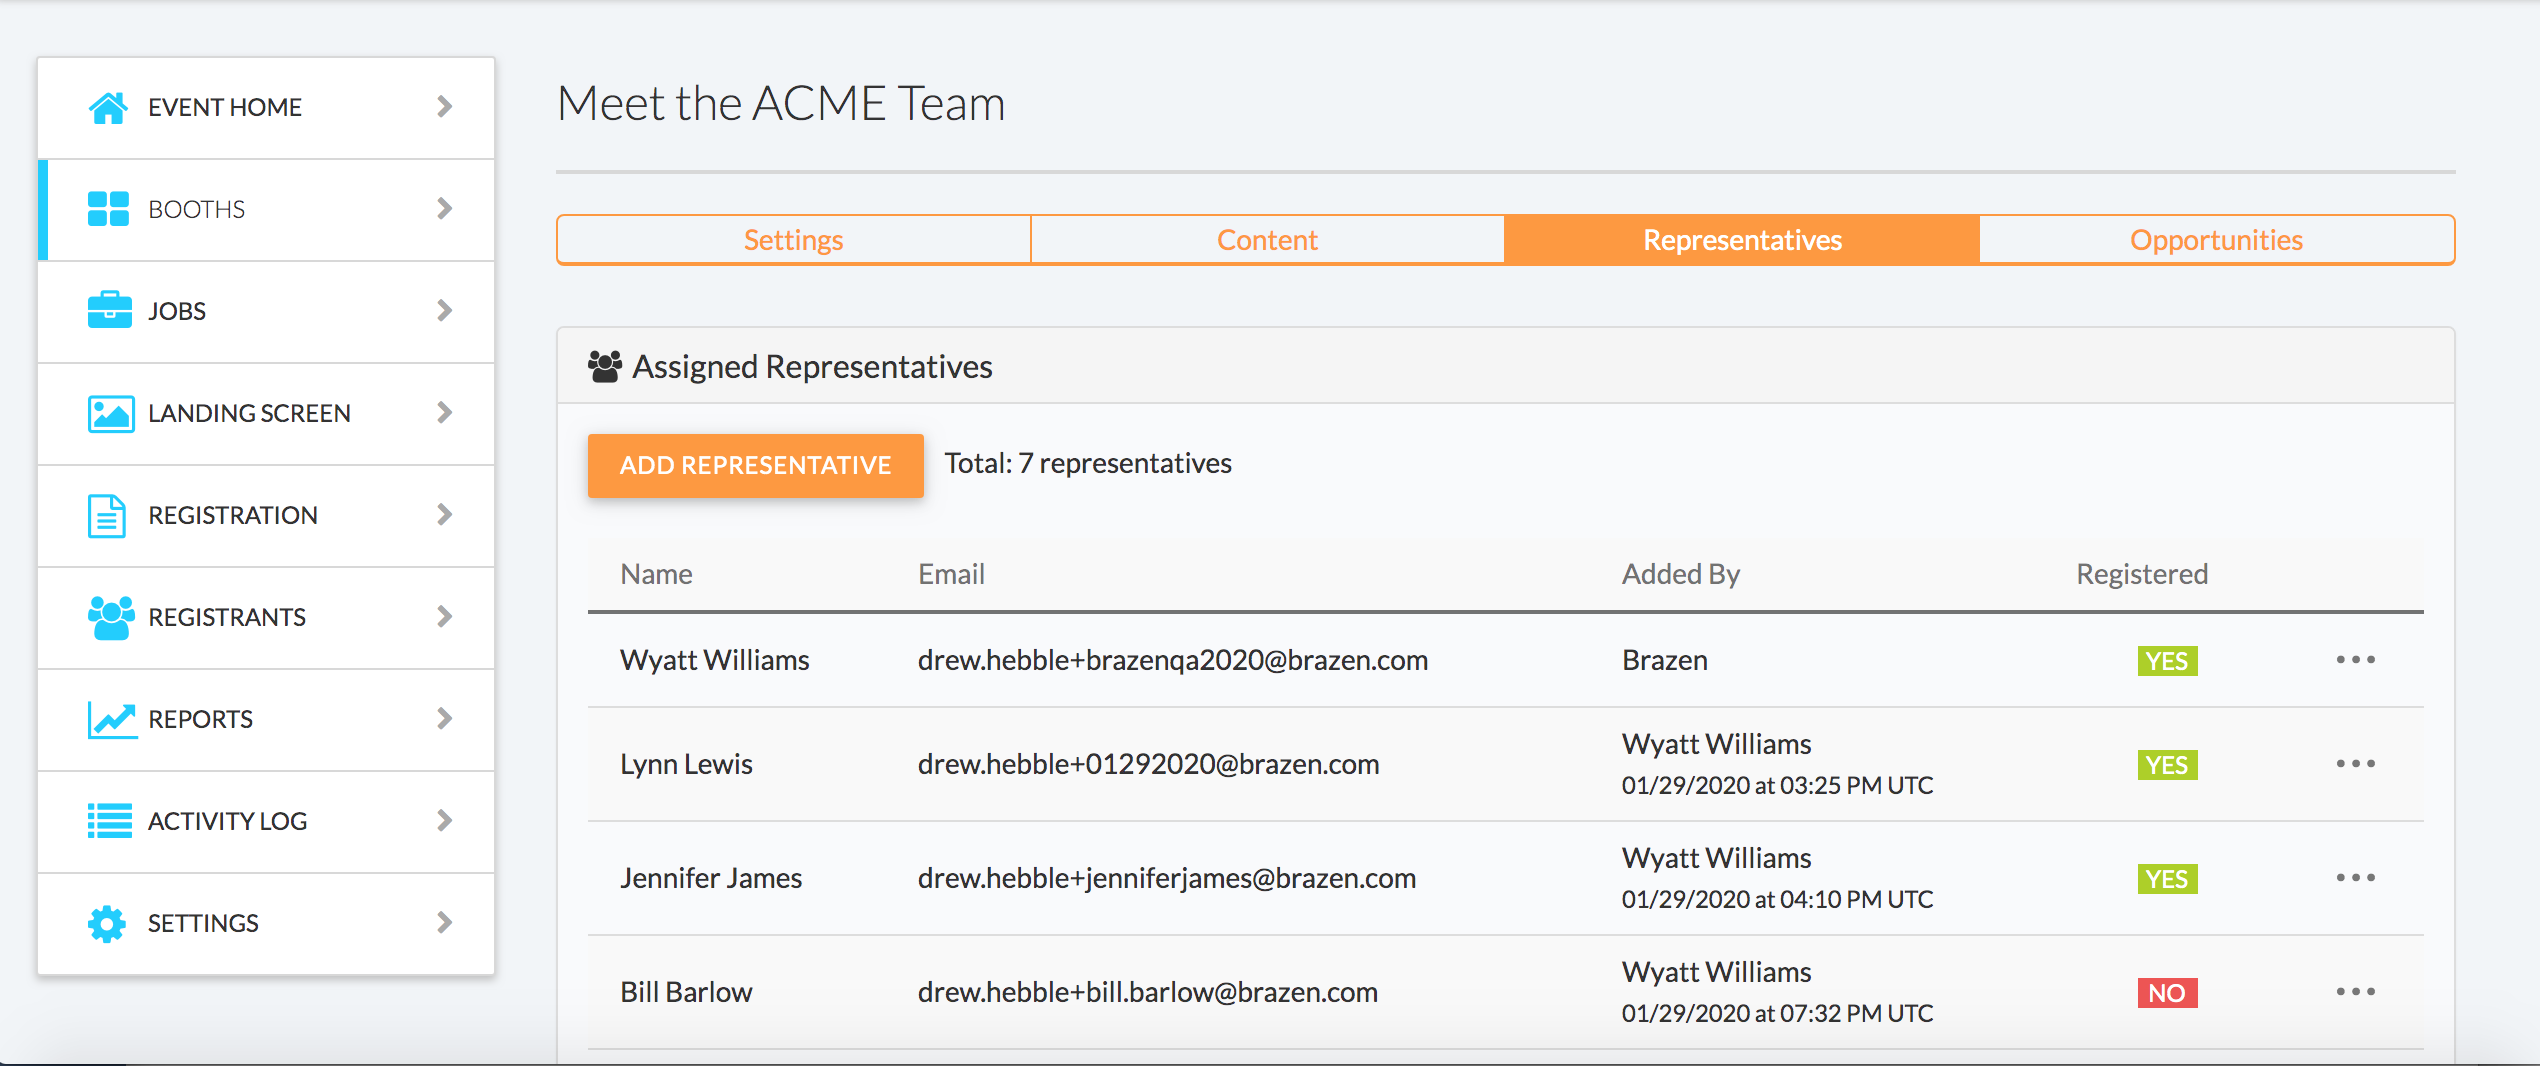 Brazen adding representatives